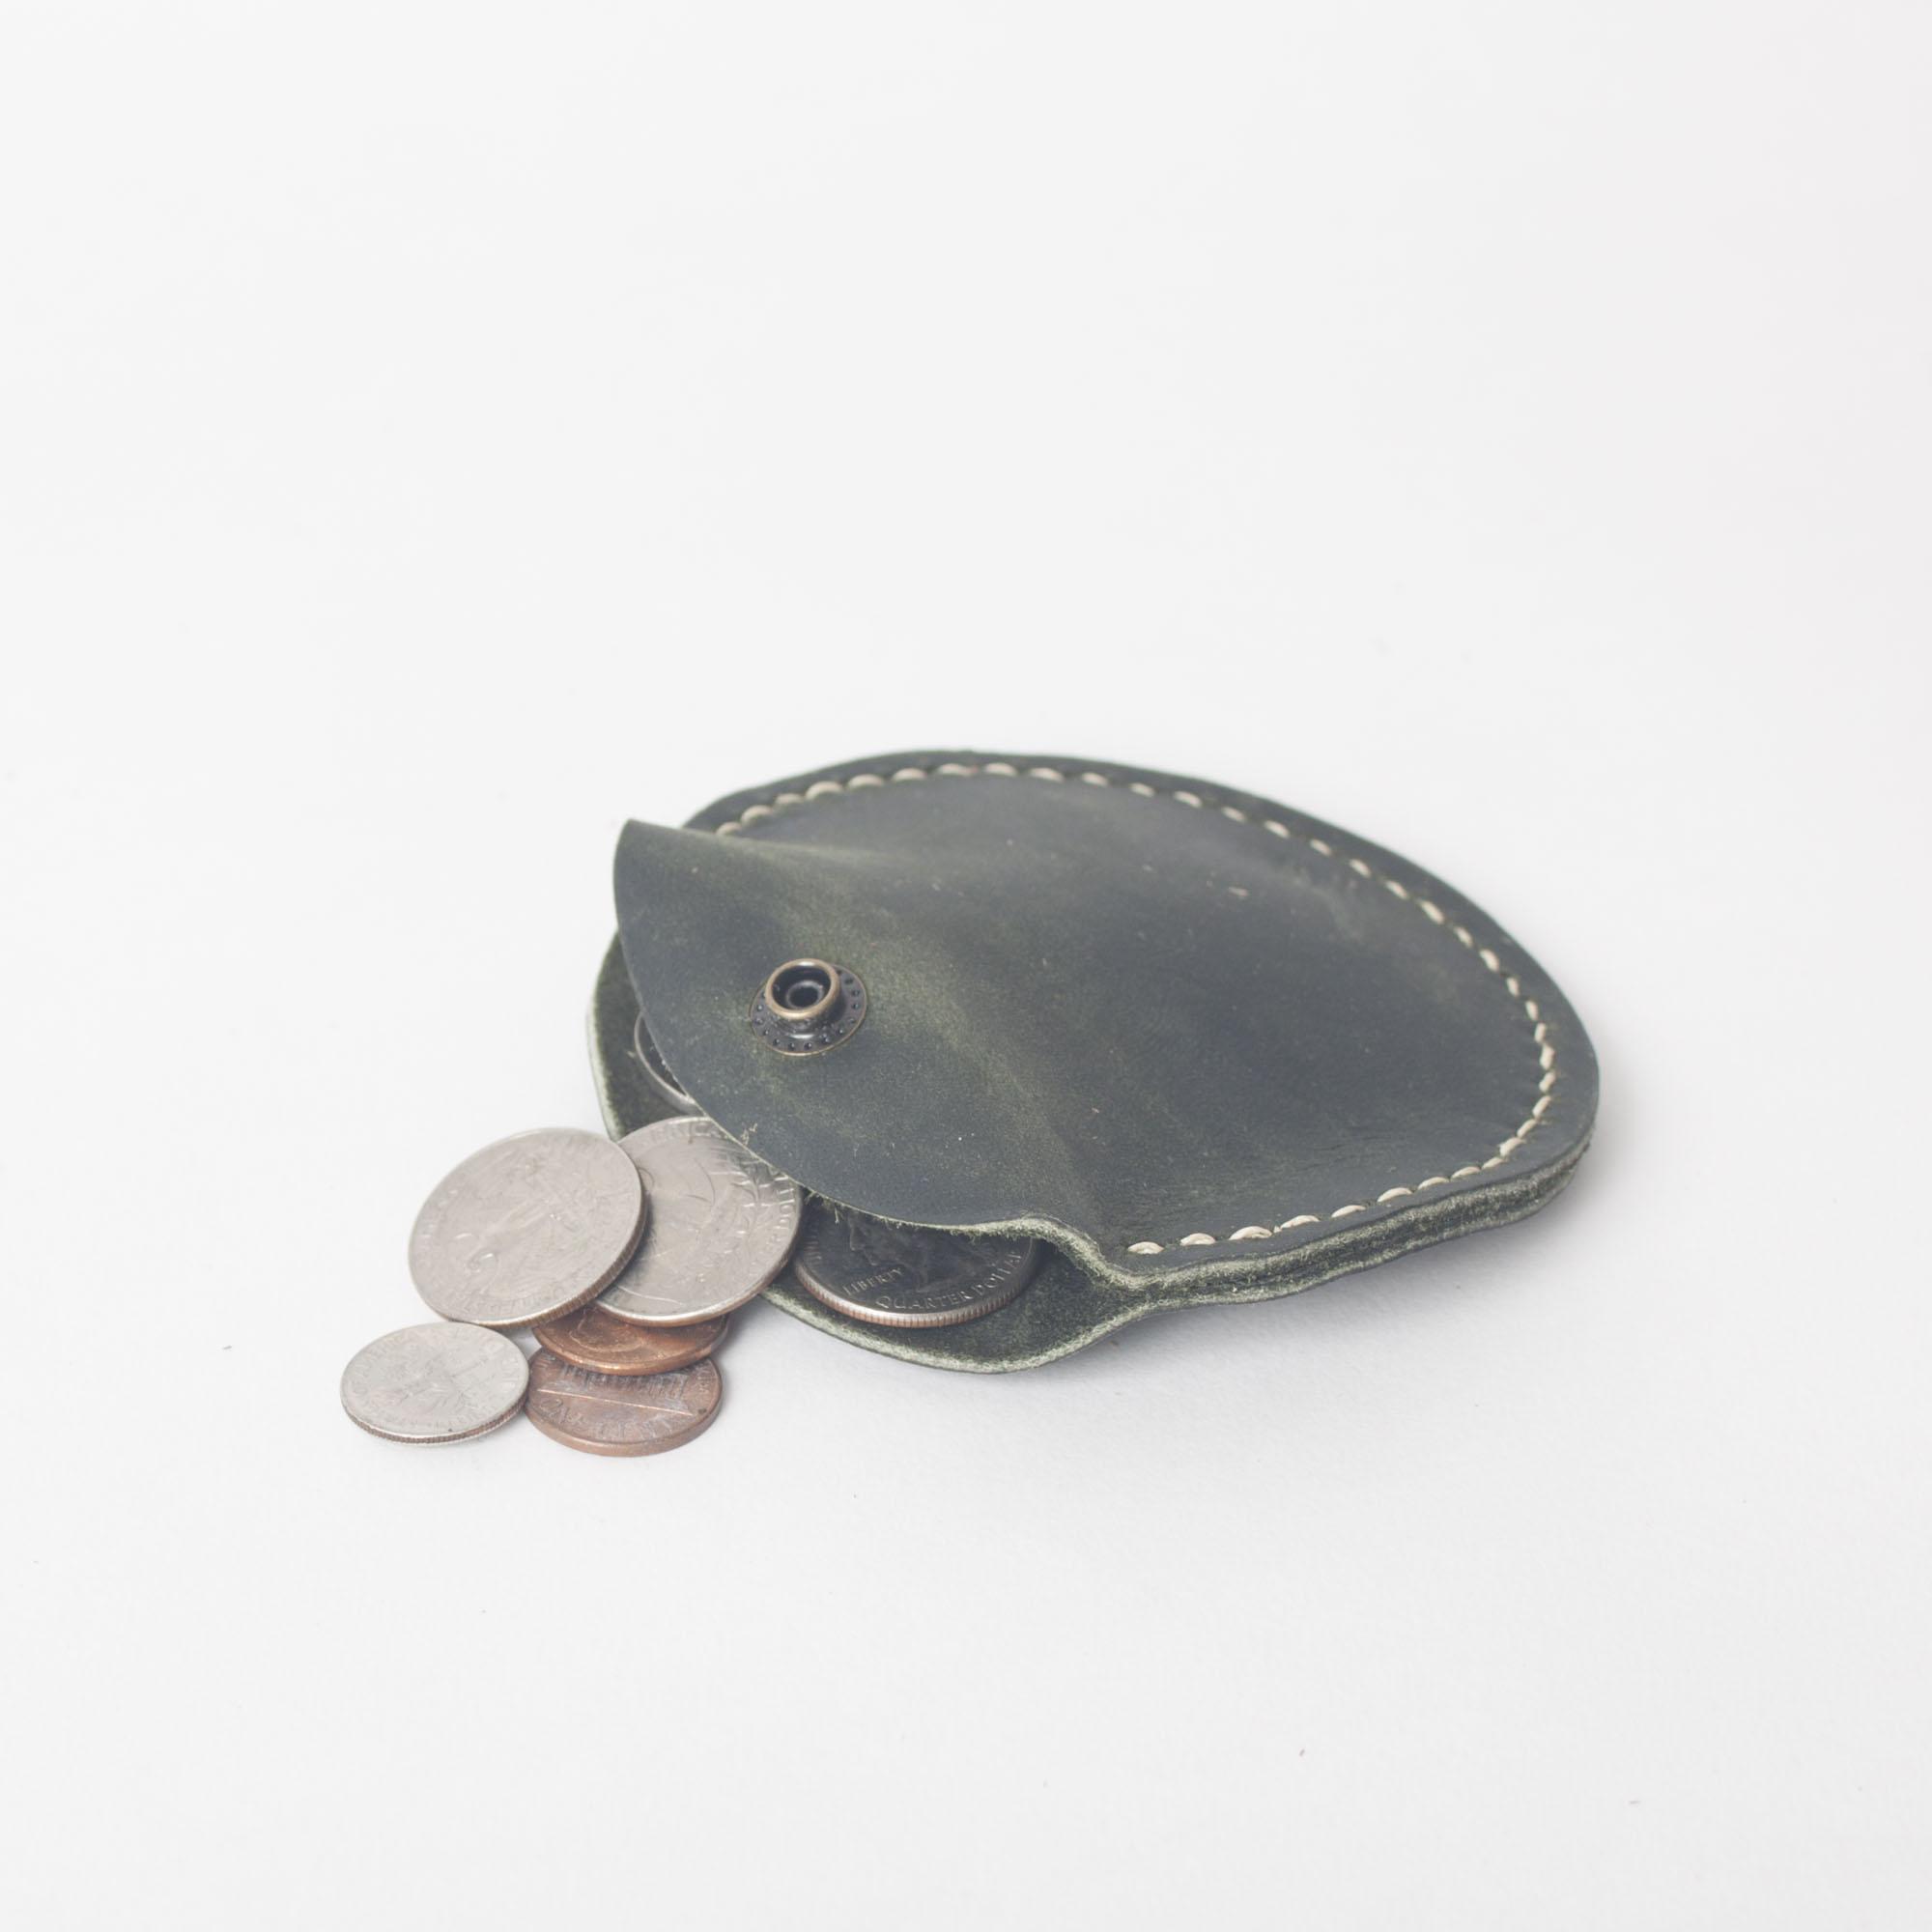 Coin Purse - $10